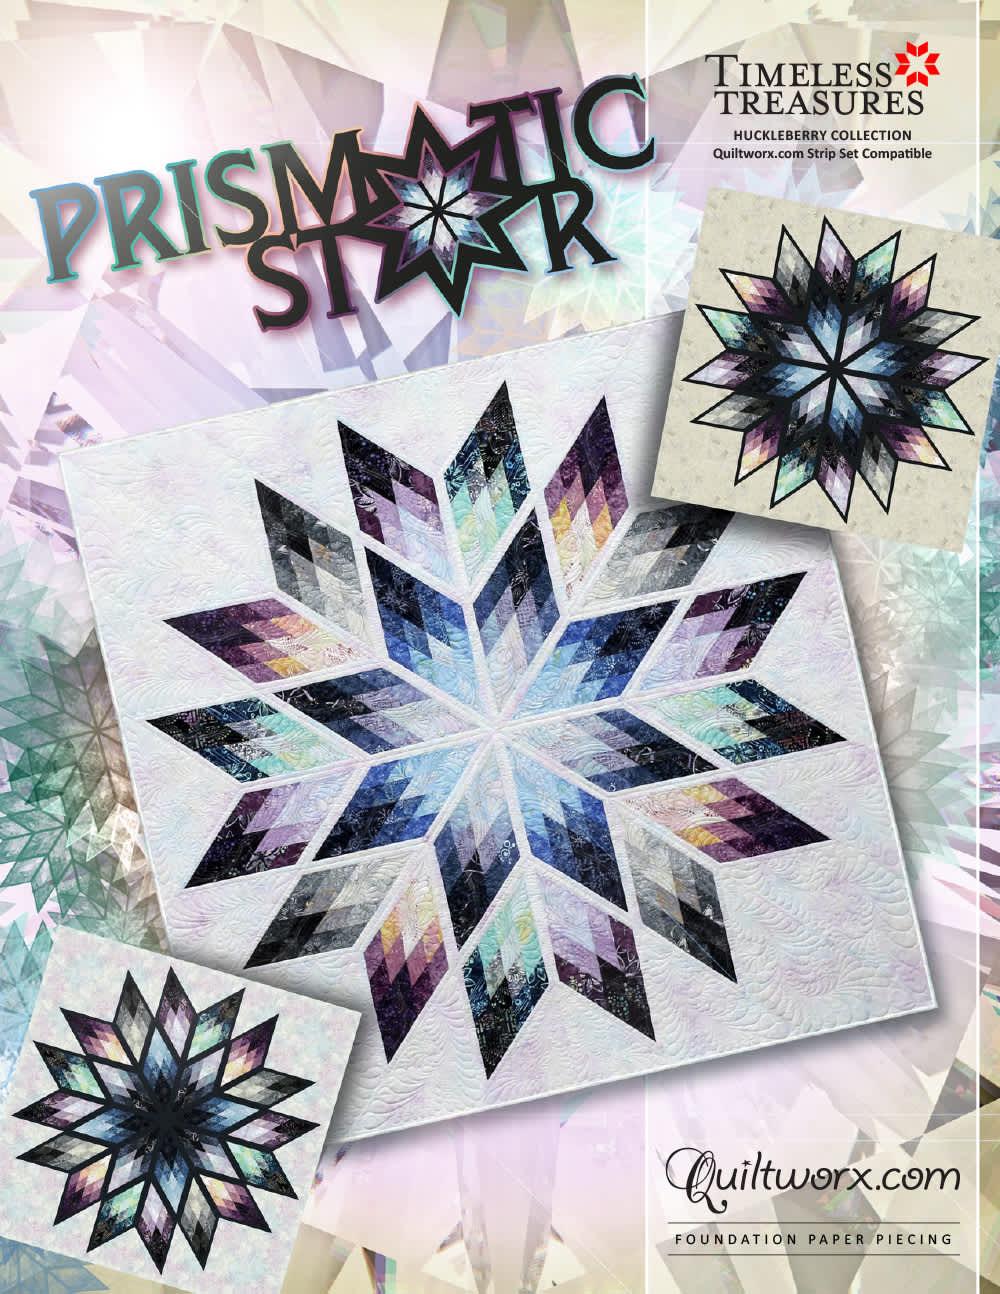 Prismatic Star (2018)